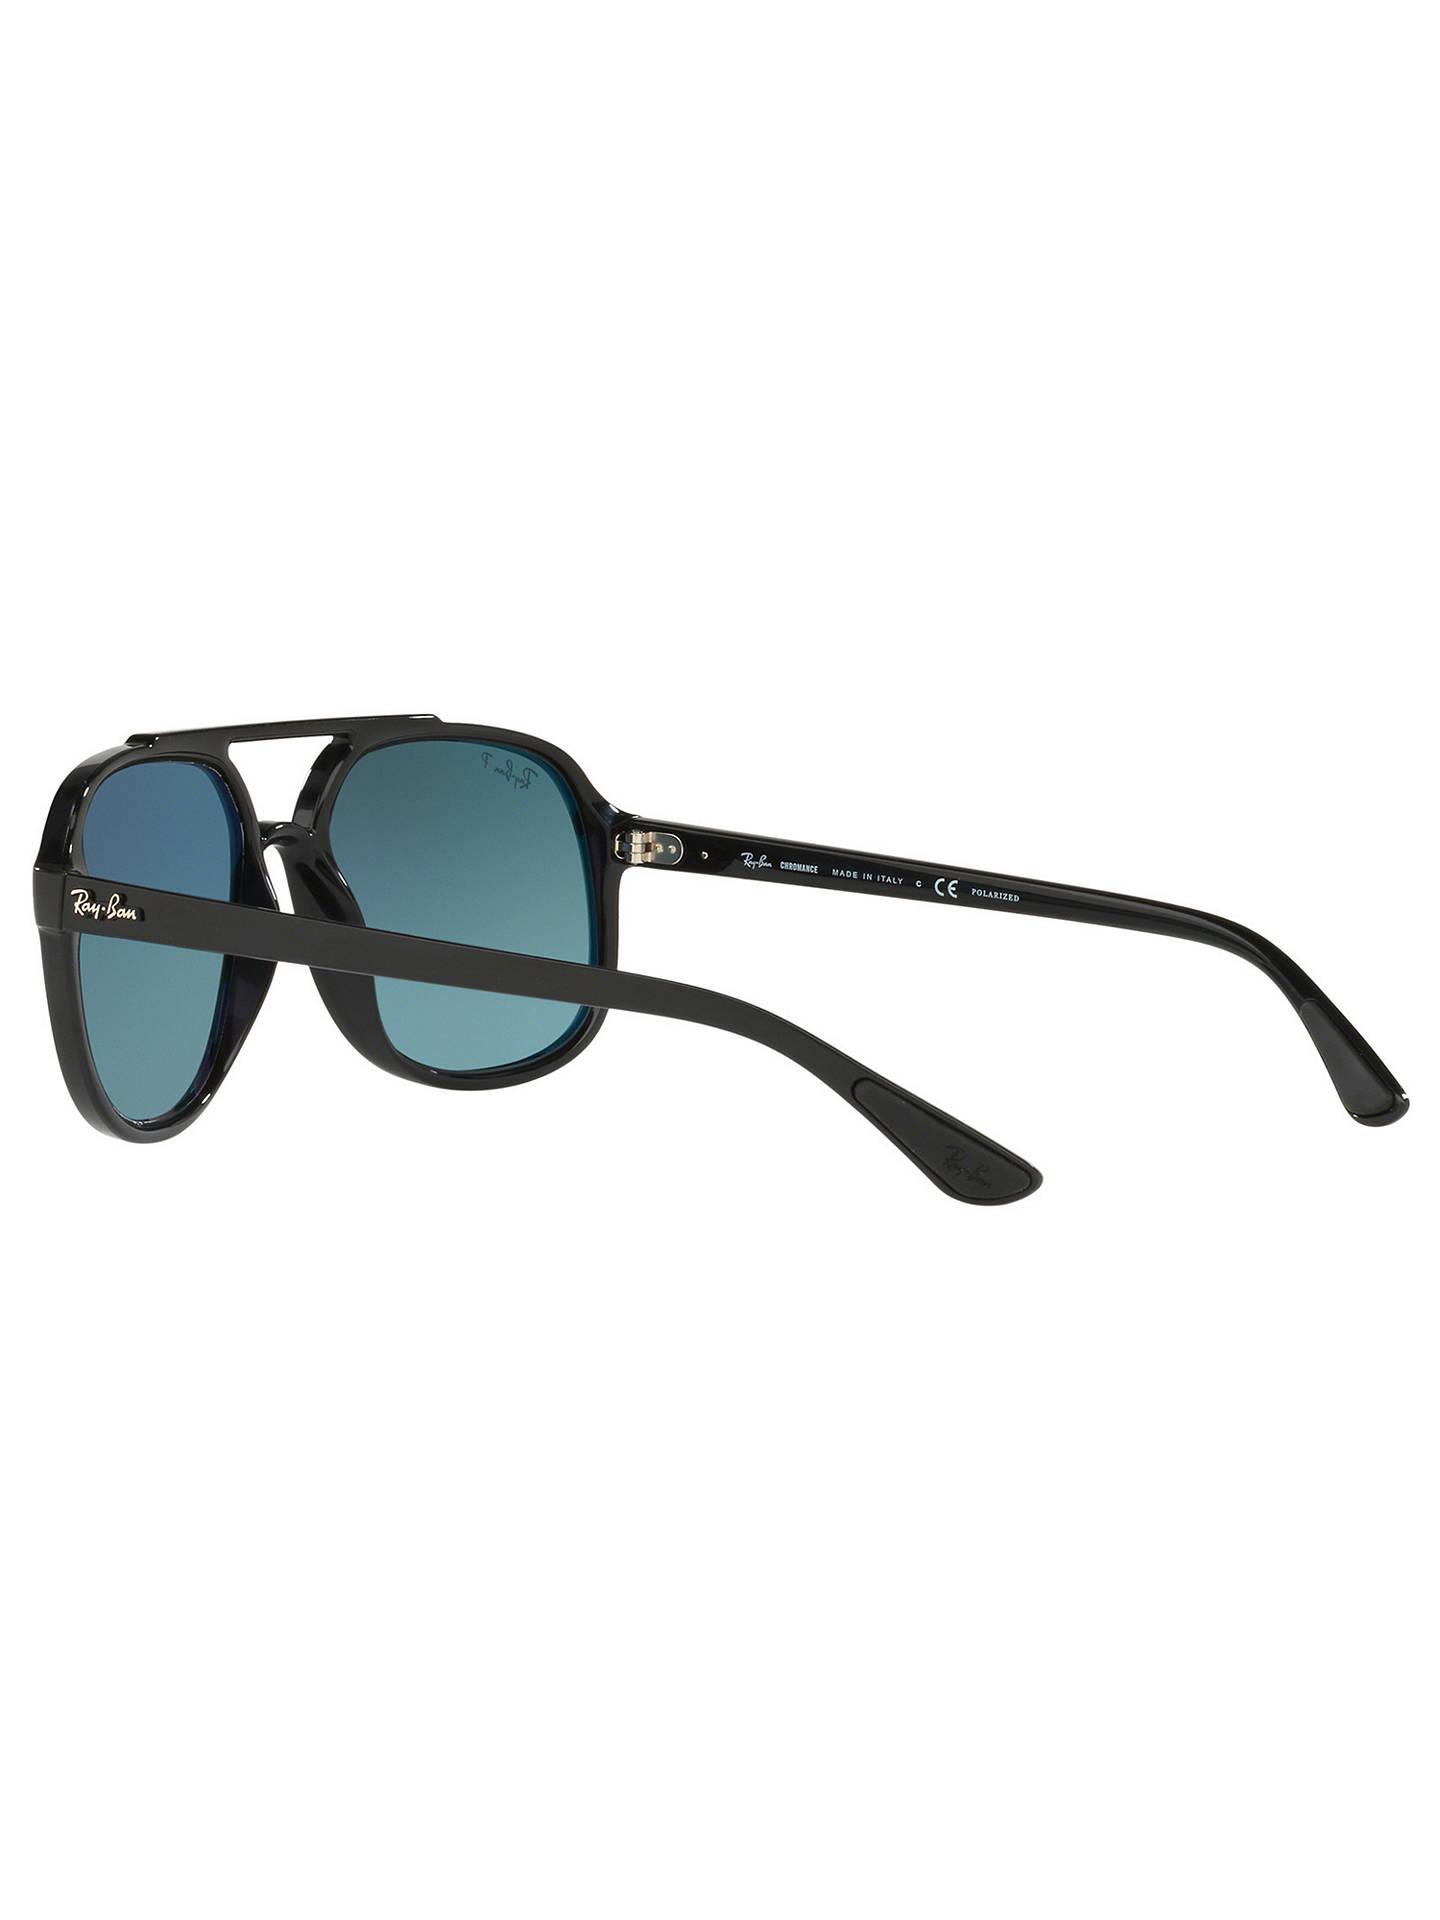 92799944156c6c rayban rb4312 men s square sunglasses black gold performance ...